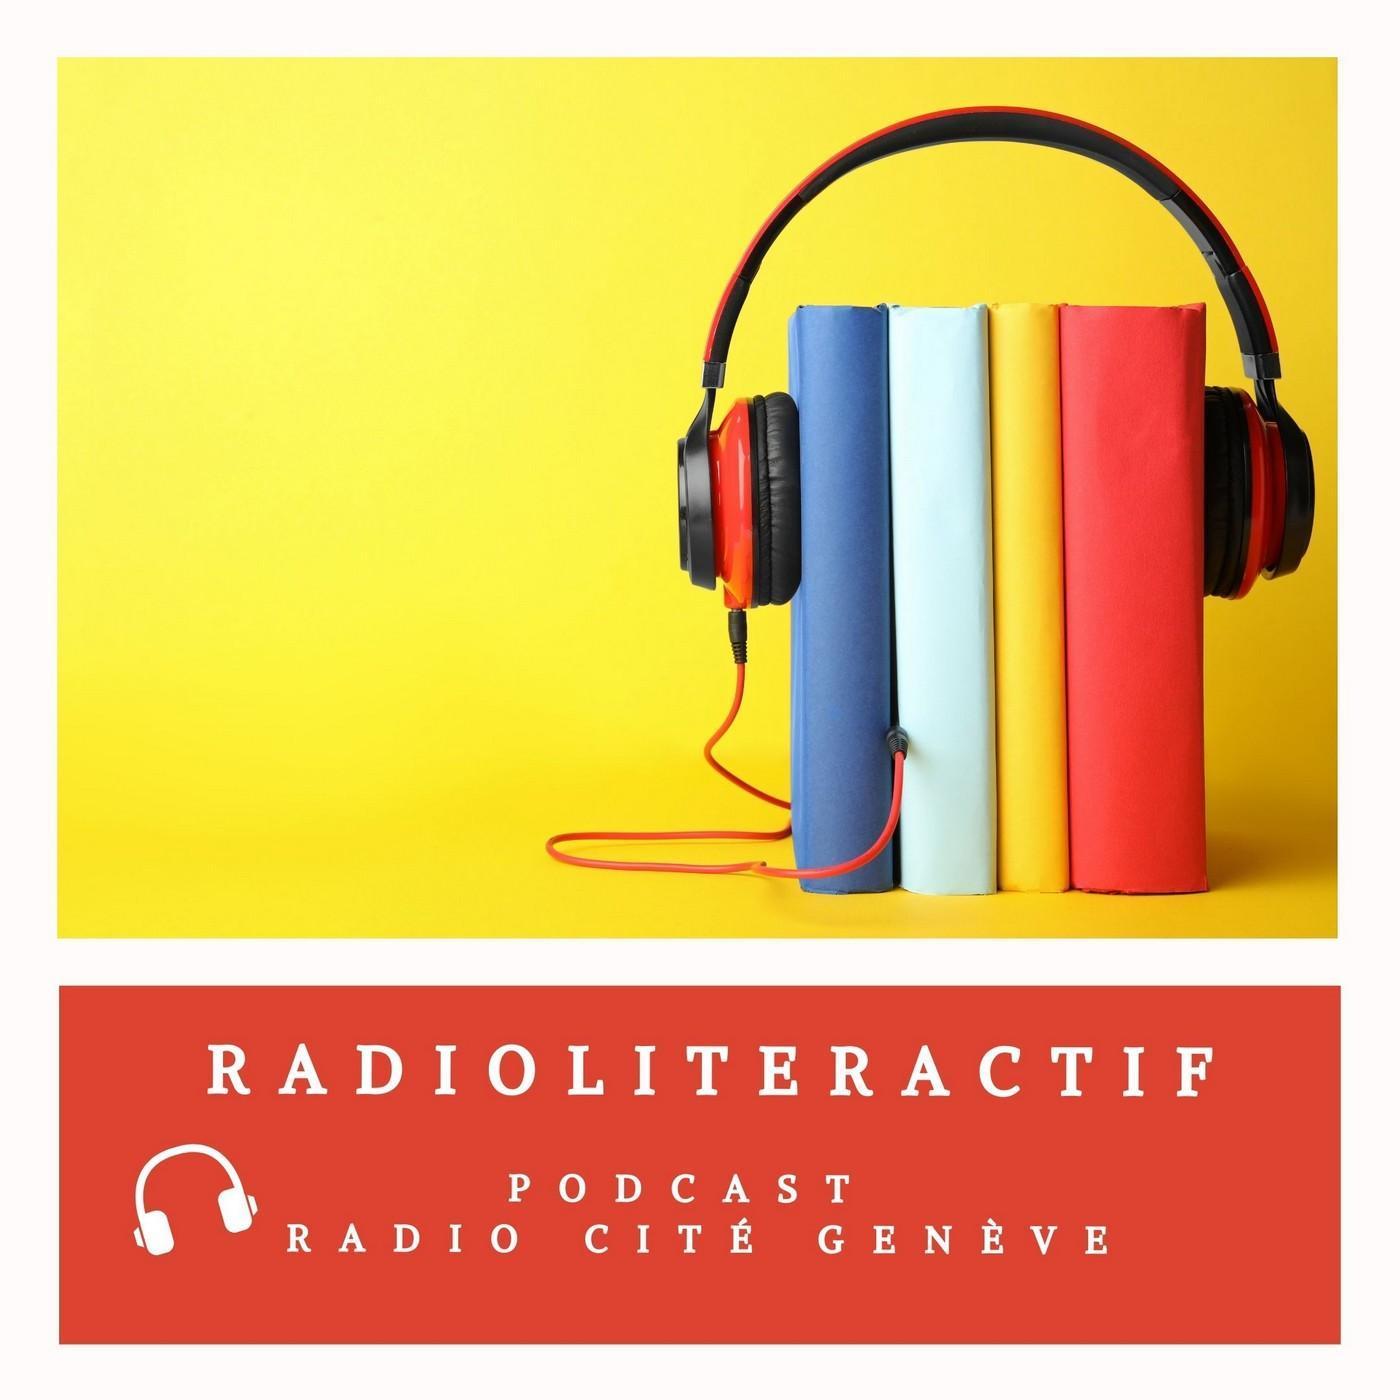 Radioliteractif du 26/04/2021 -Alain Borer & Jean-Christophe Contini